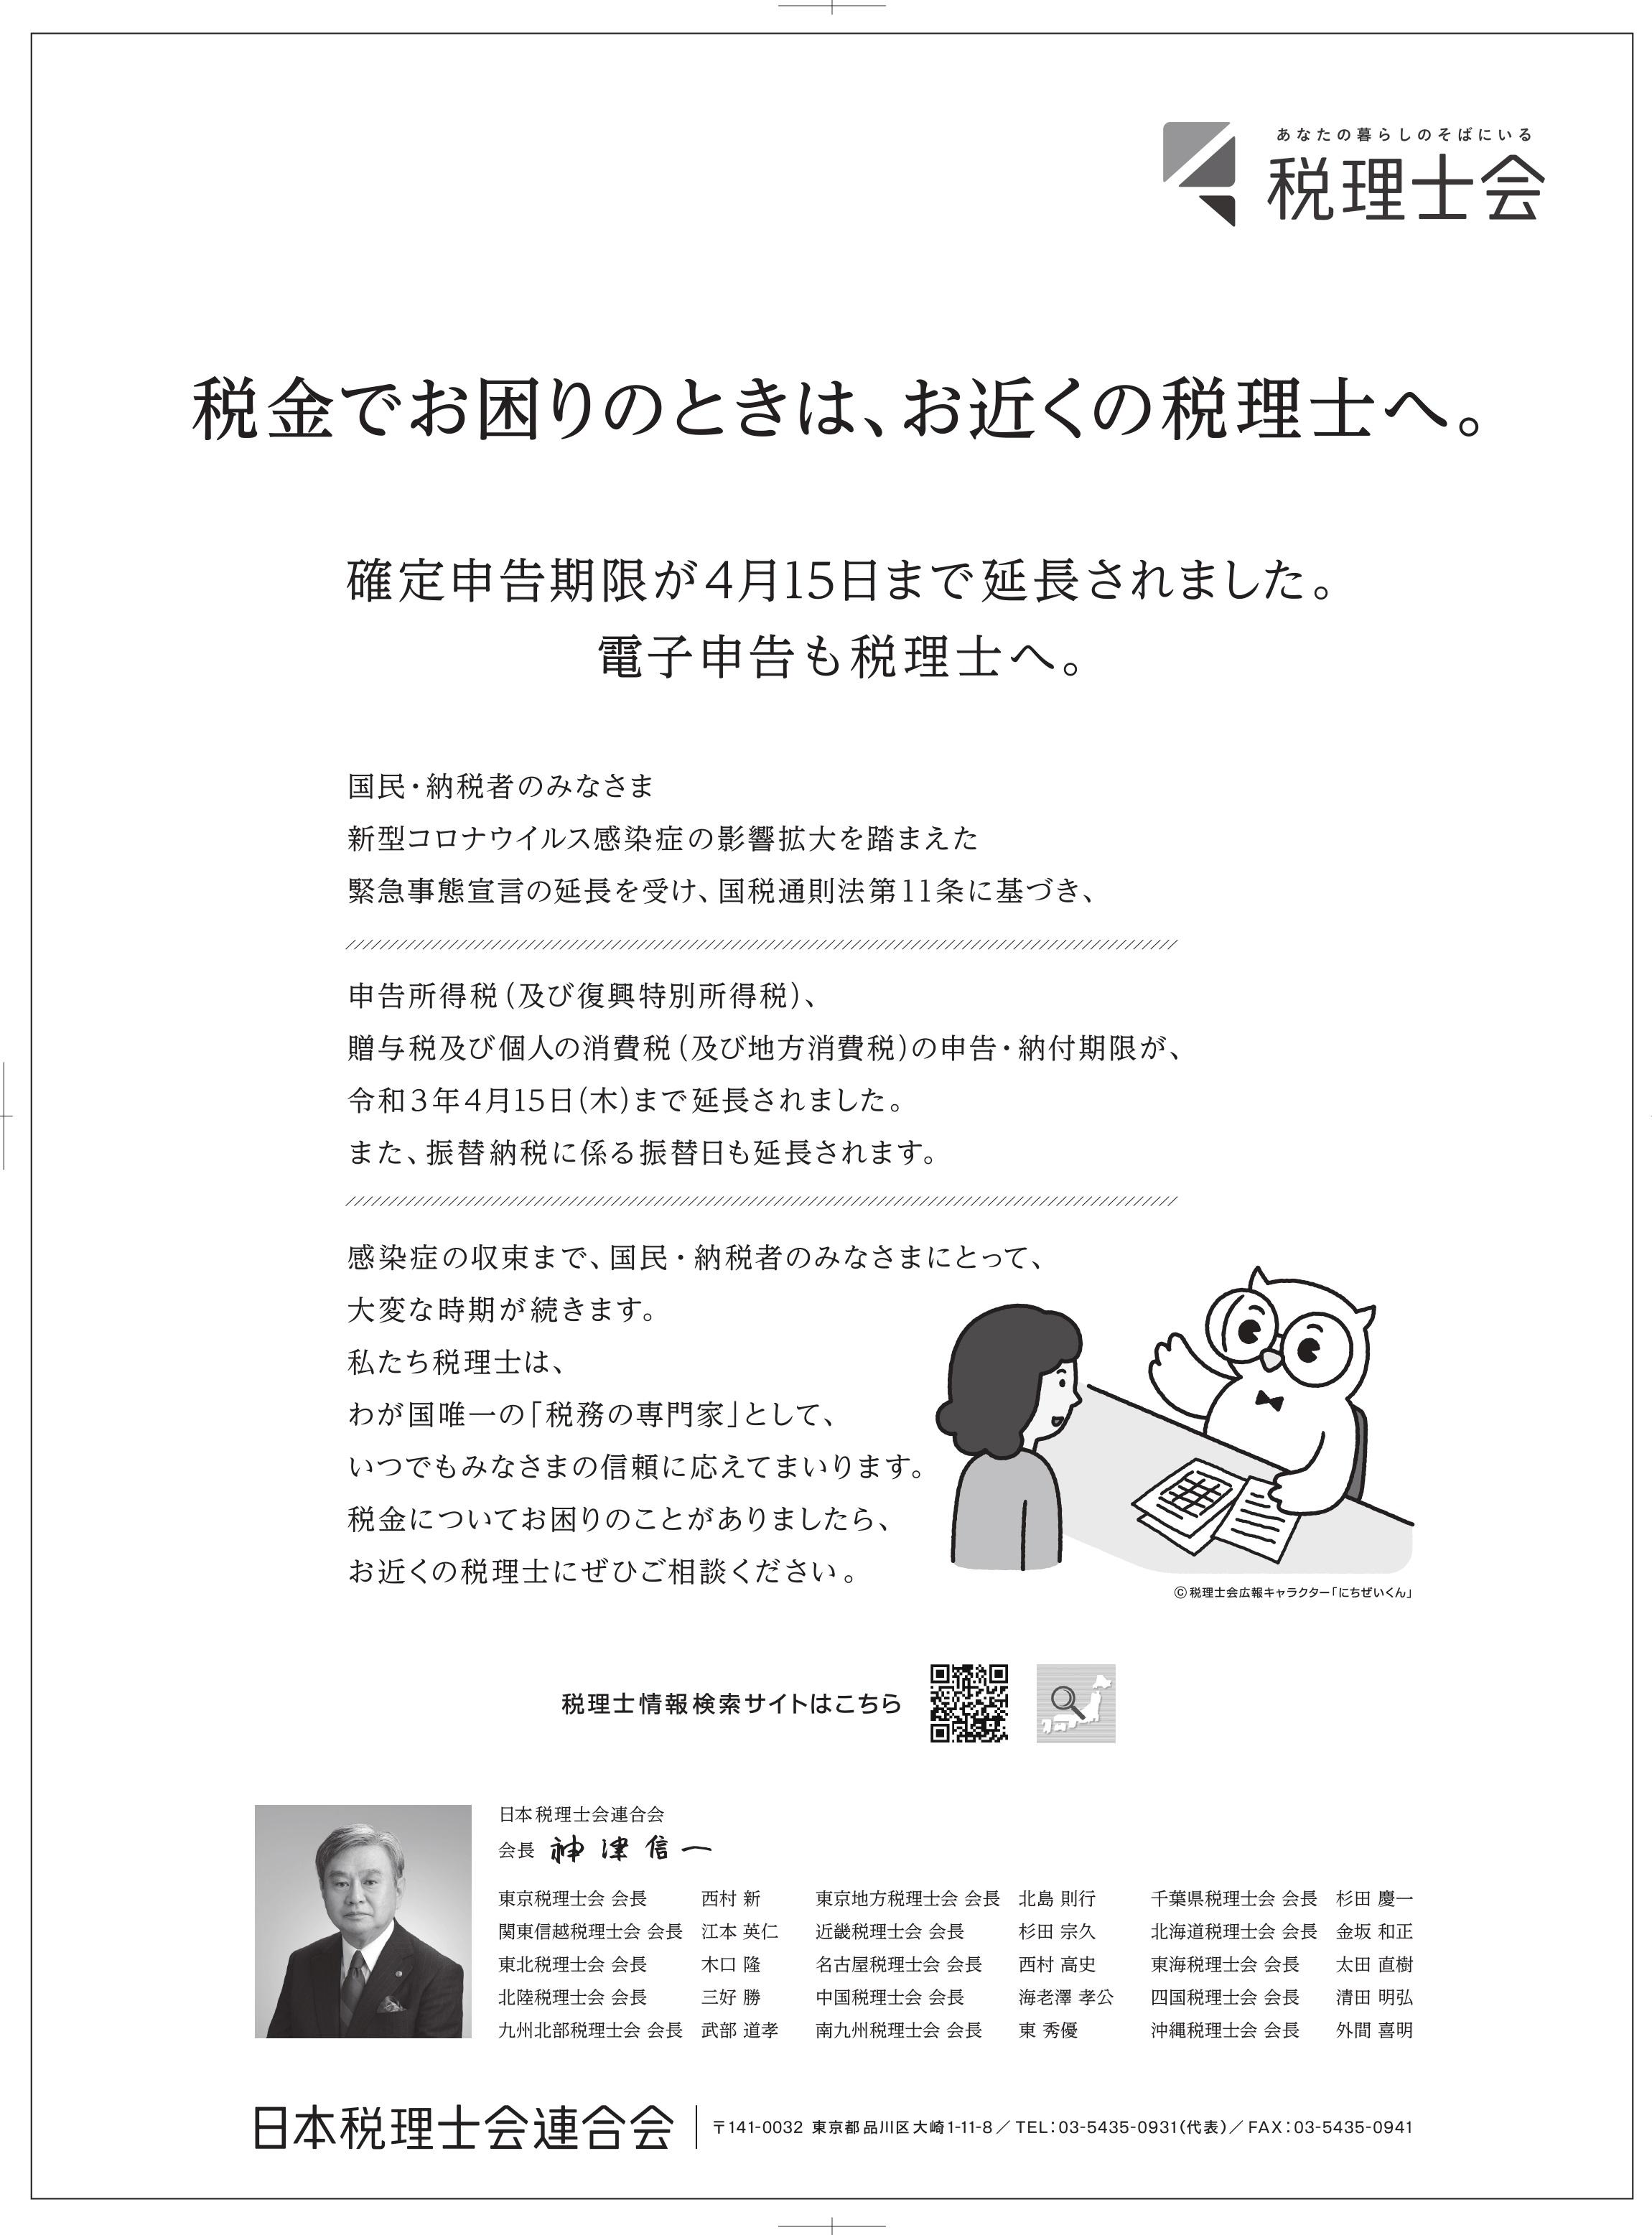 https://www.nichizeiren.or.jp/wp-content/uploads/whatsnew/img_info210223.jpg